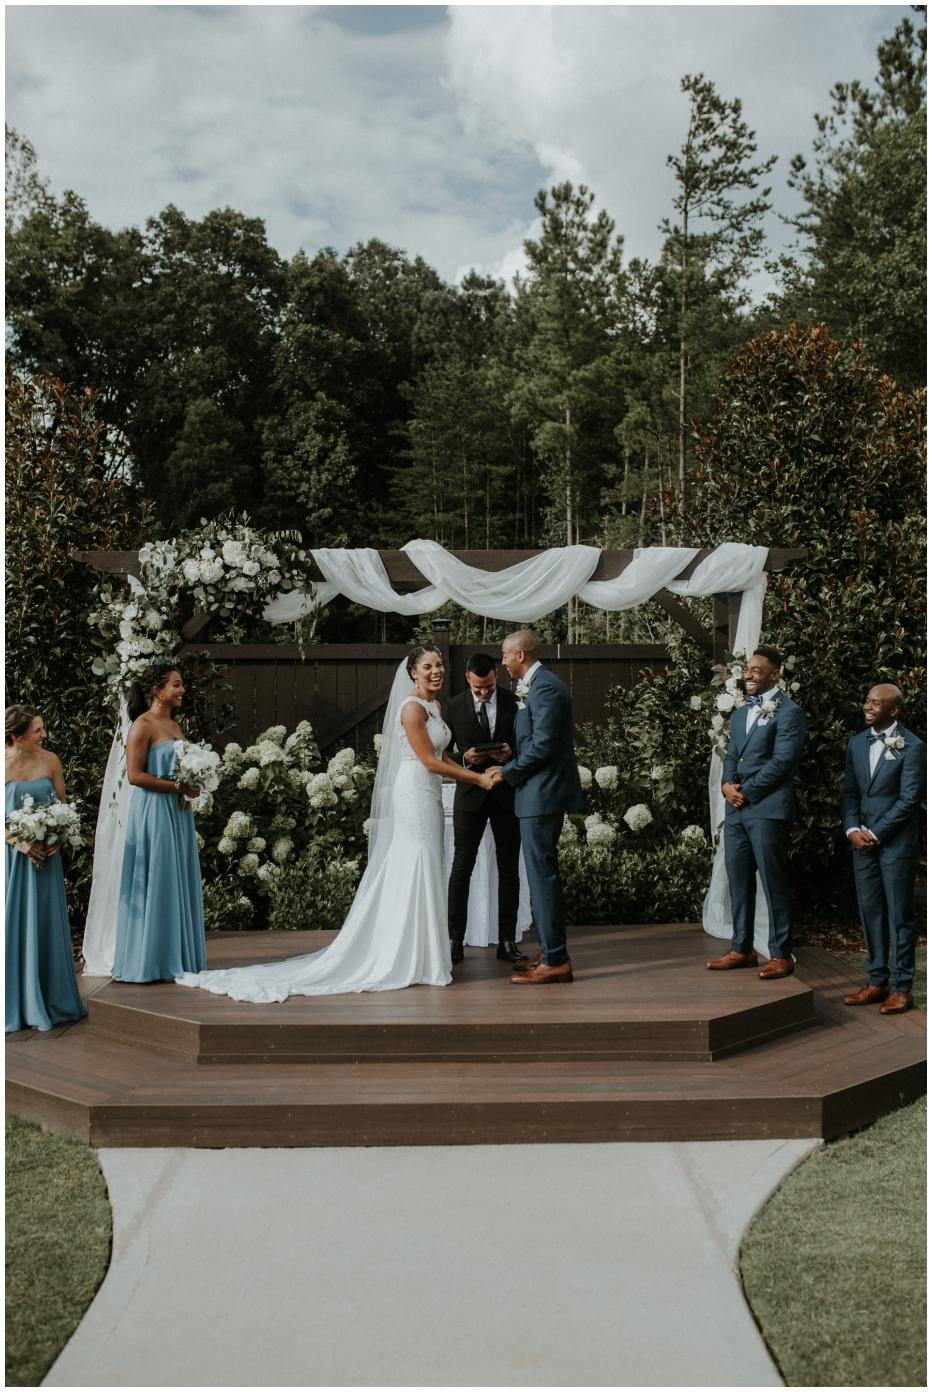 Posh-Moments-Photography-NC- Wedding-Photographer-Rolling-Hills-Farms-Wedding-Monroe-NC-Charlotte-NC_0267.jpg